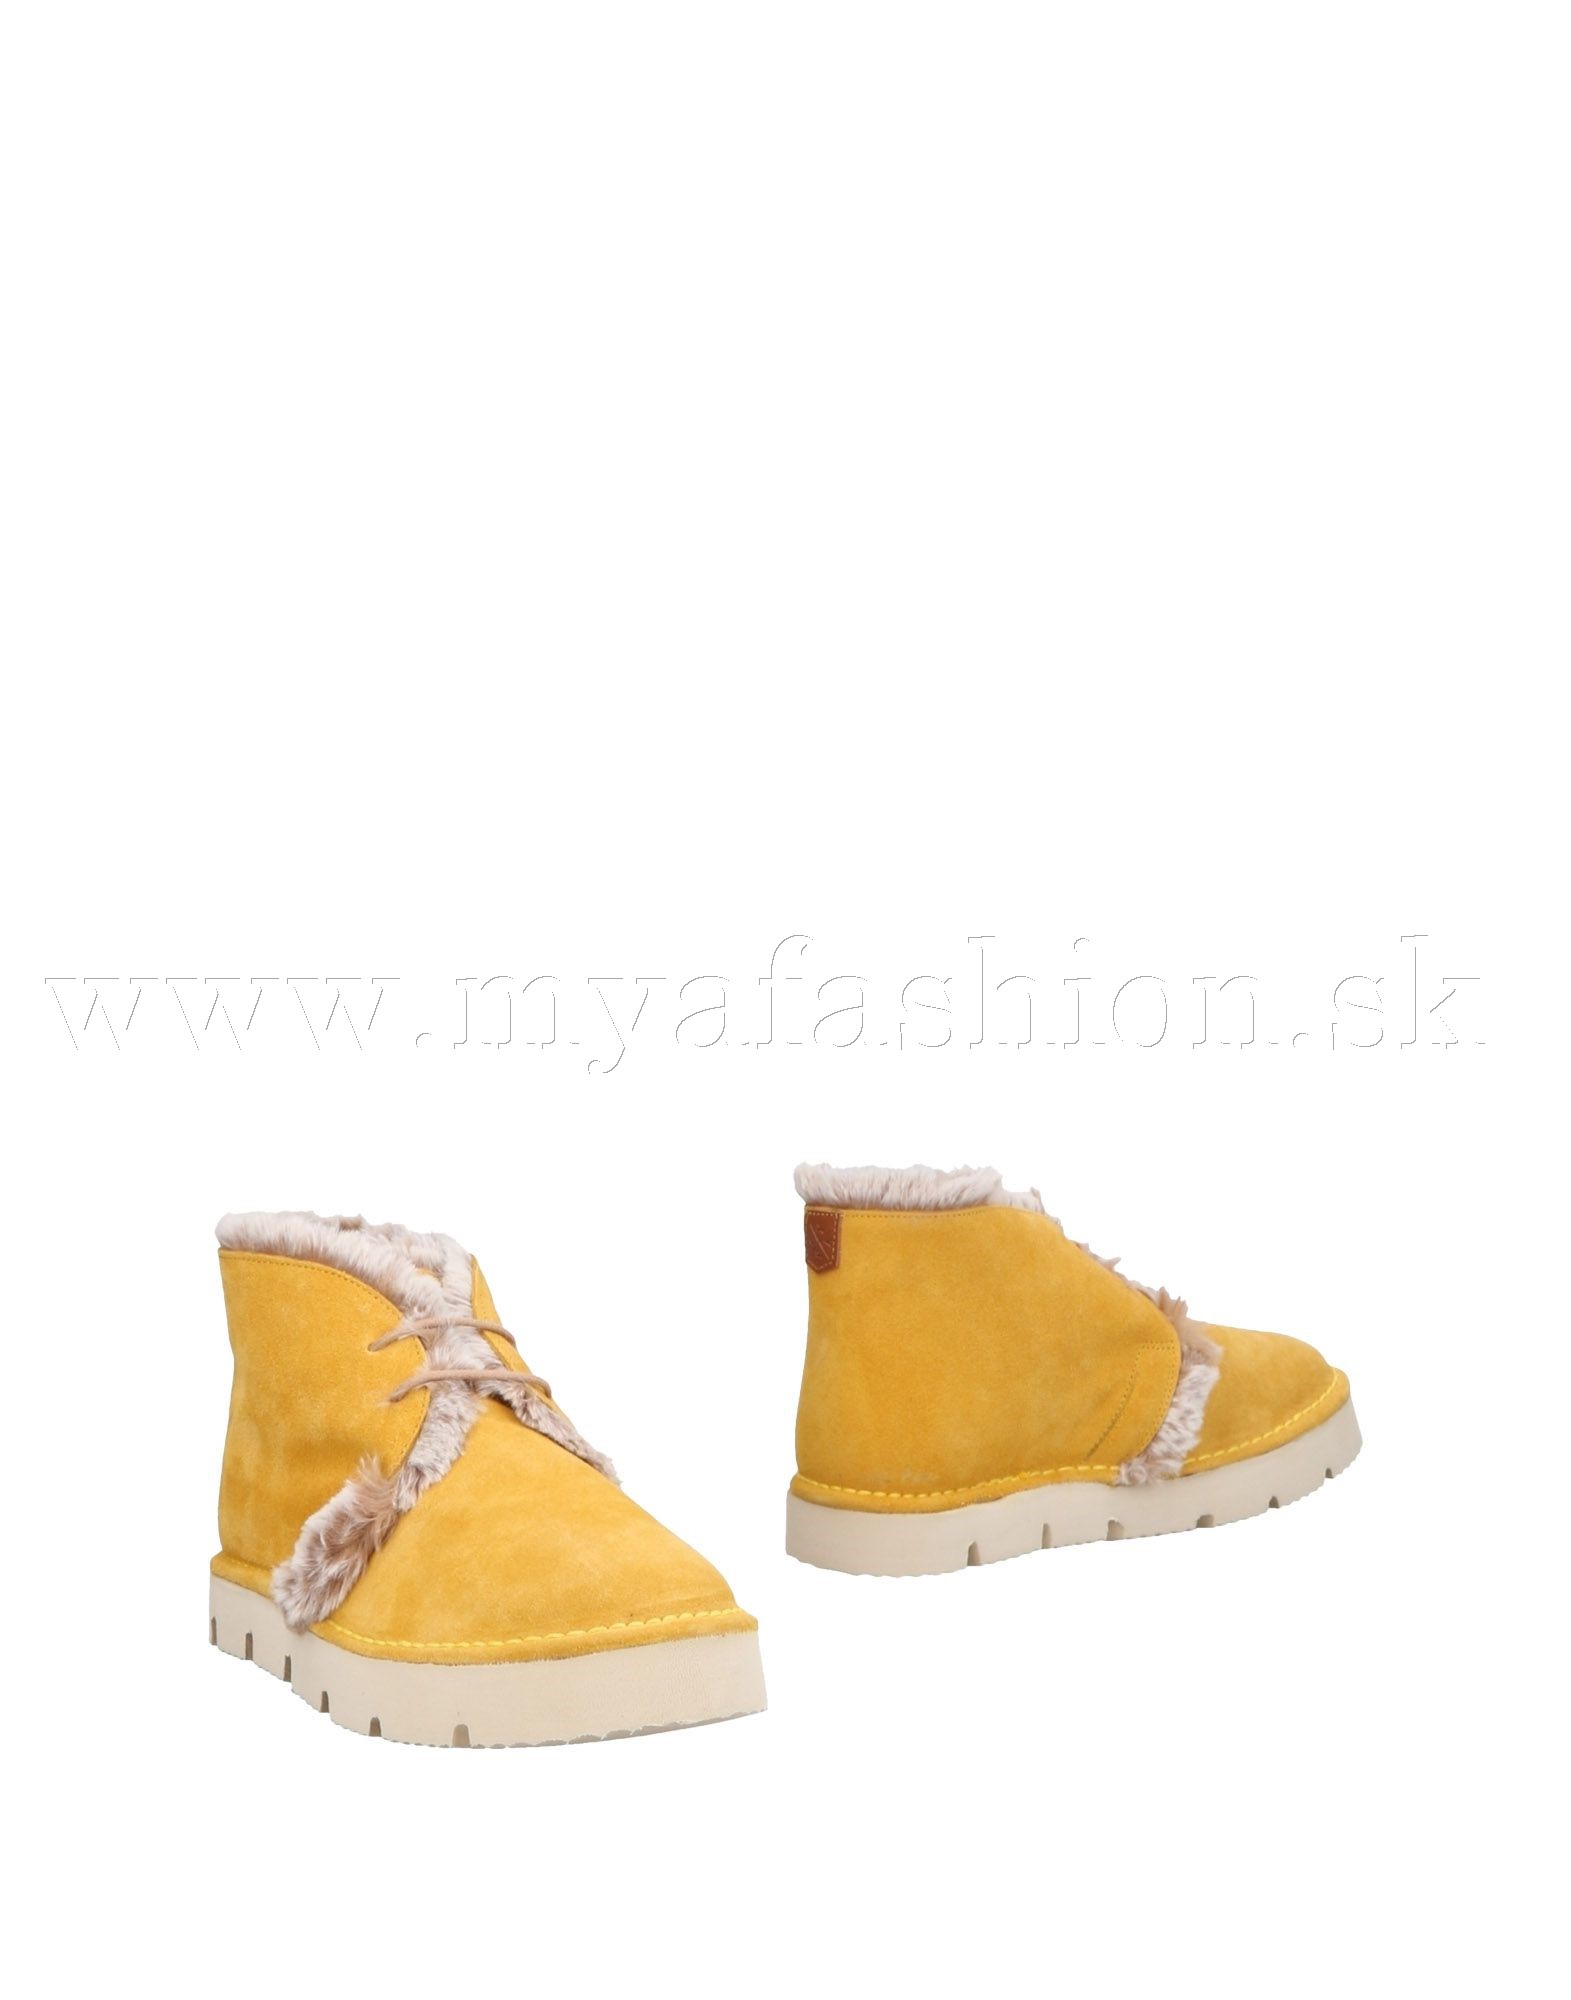 ff71687673 Dámske topánky - dámske žlté kožušinové členkové topánky